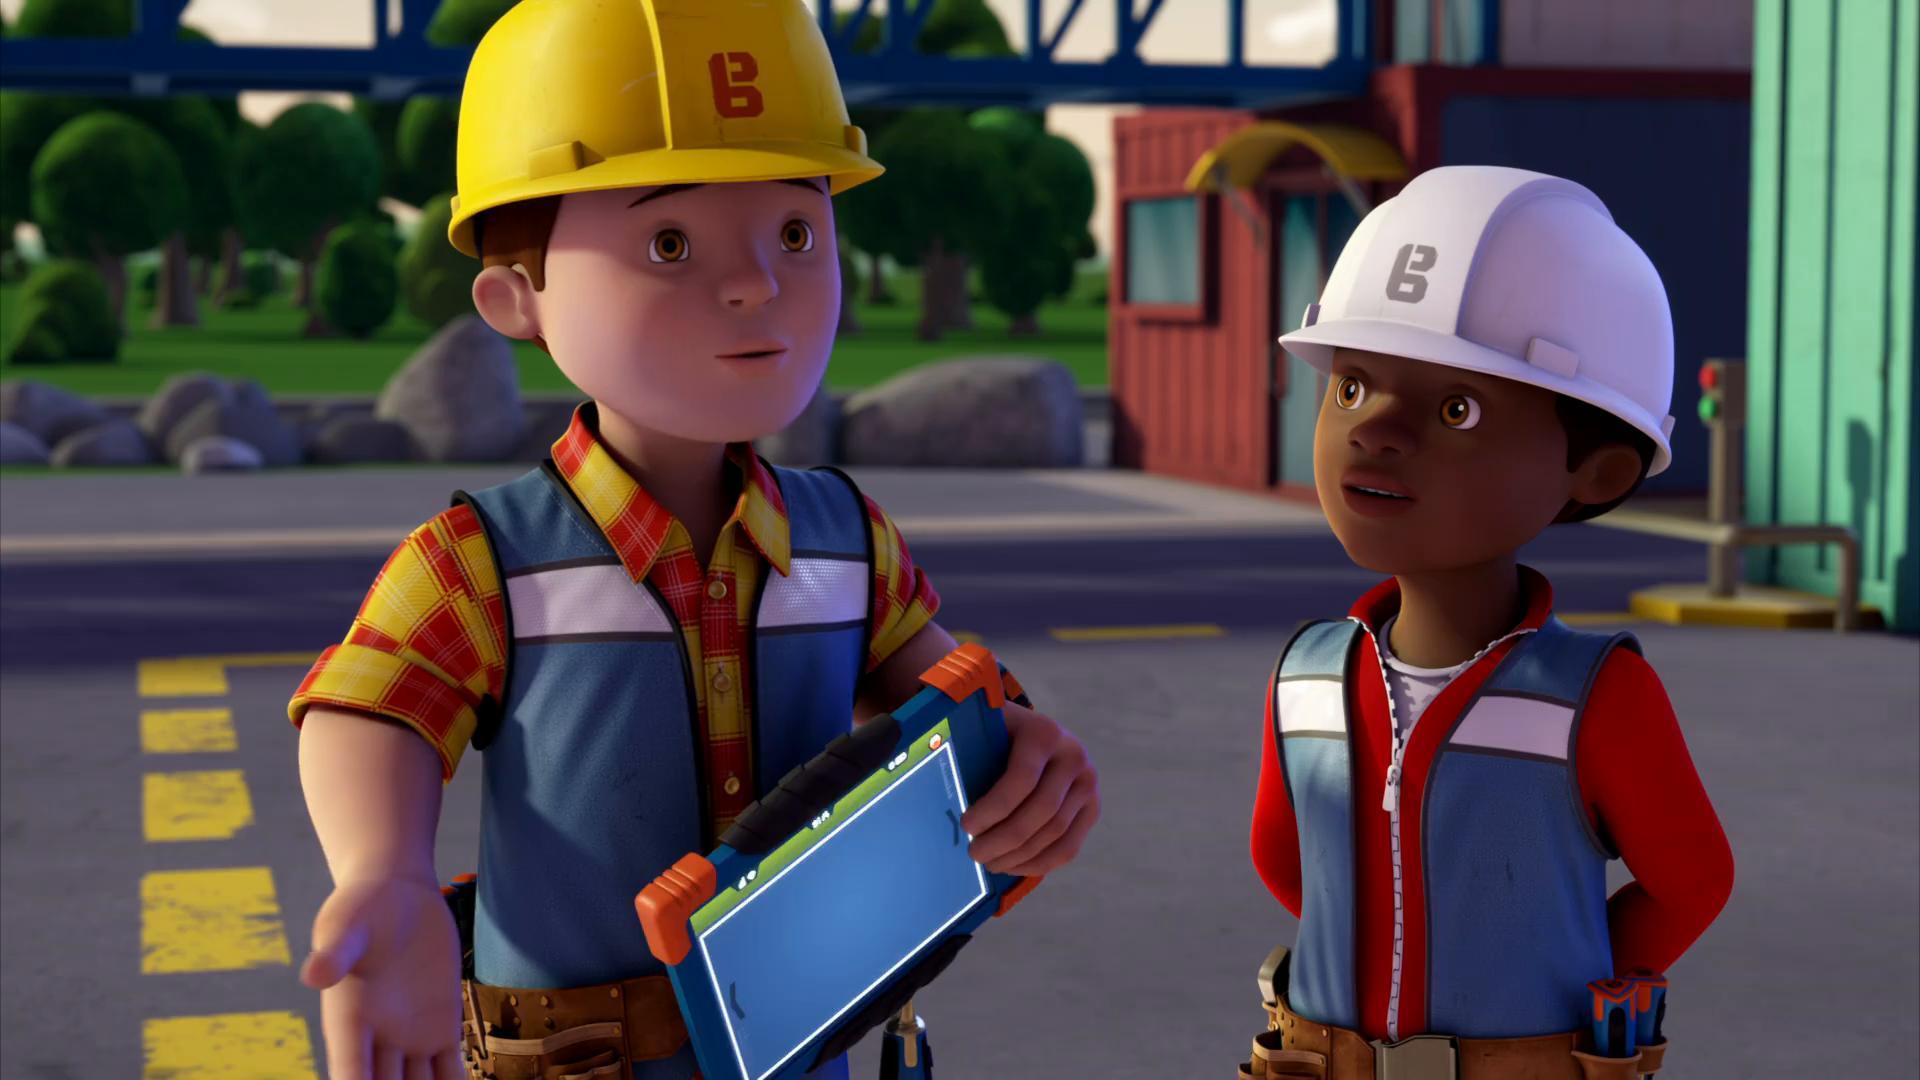 Bob the Builder - Season 2